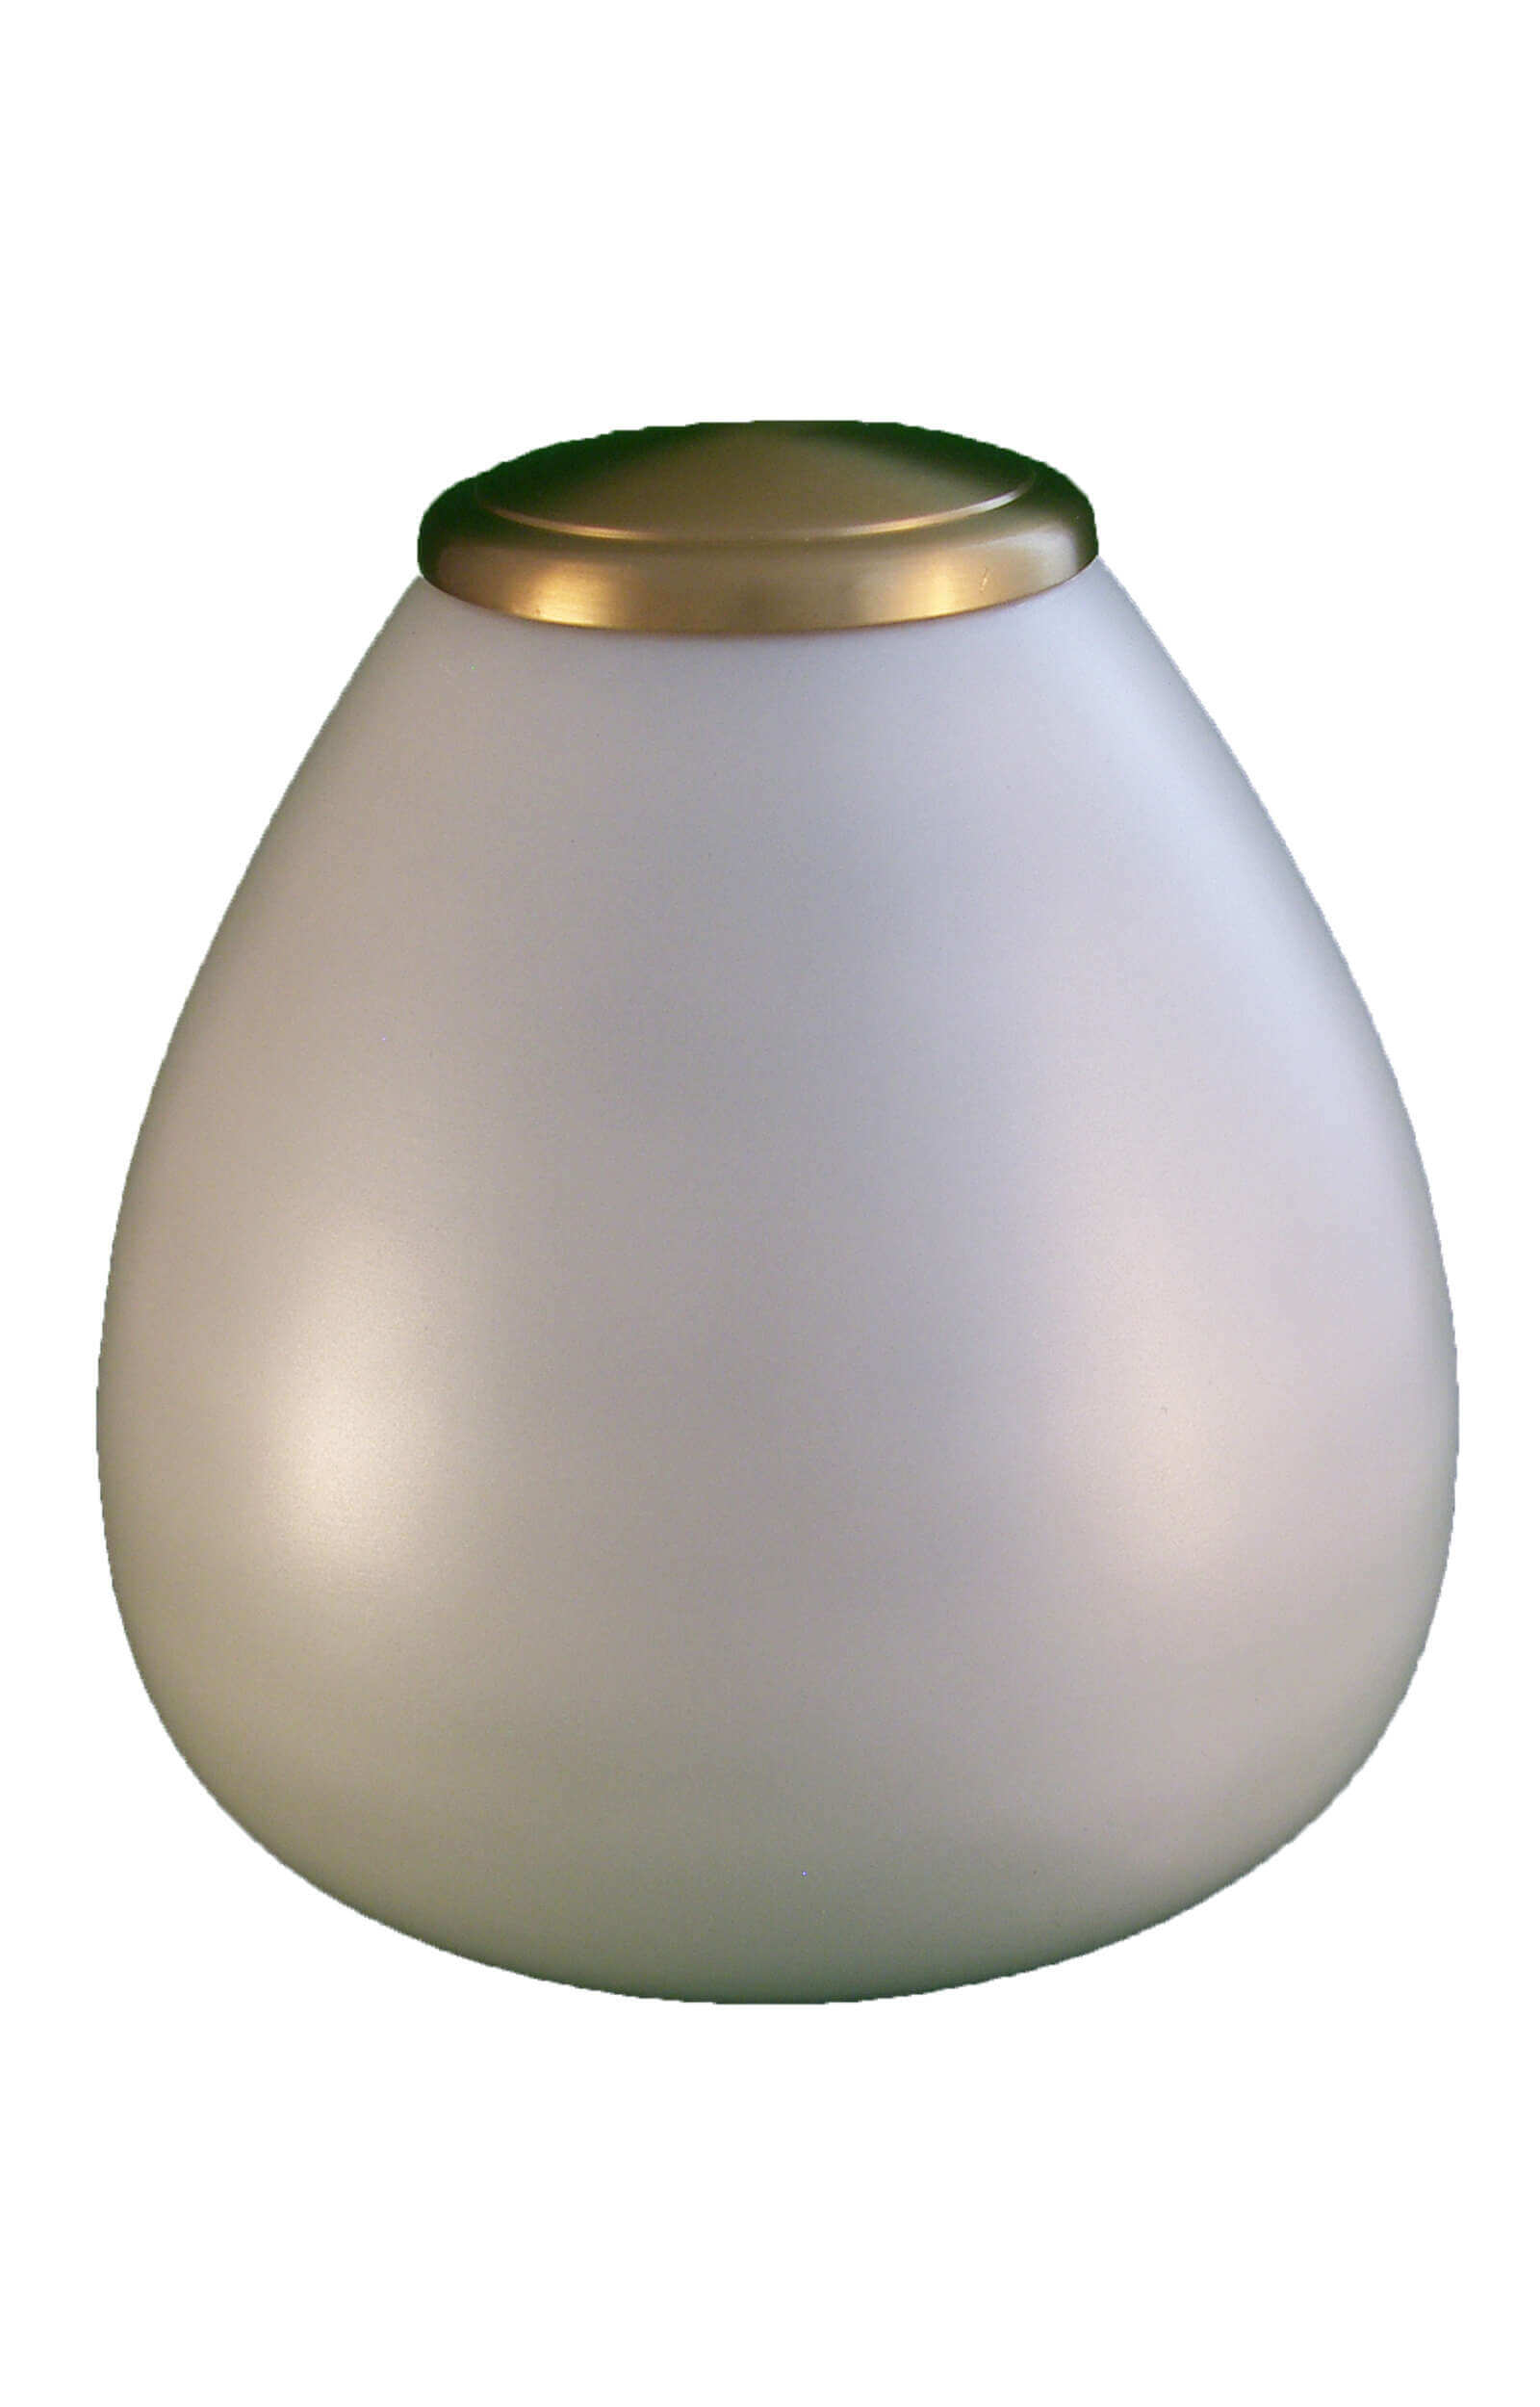 en TIB911 classic white and gold pet urn jpg